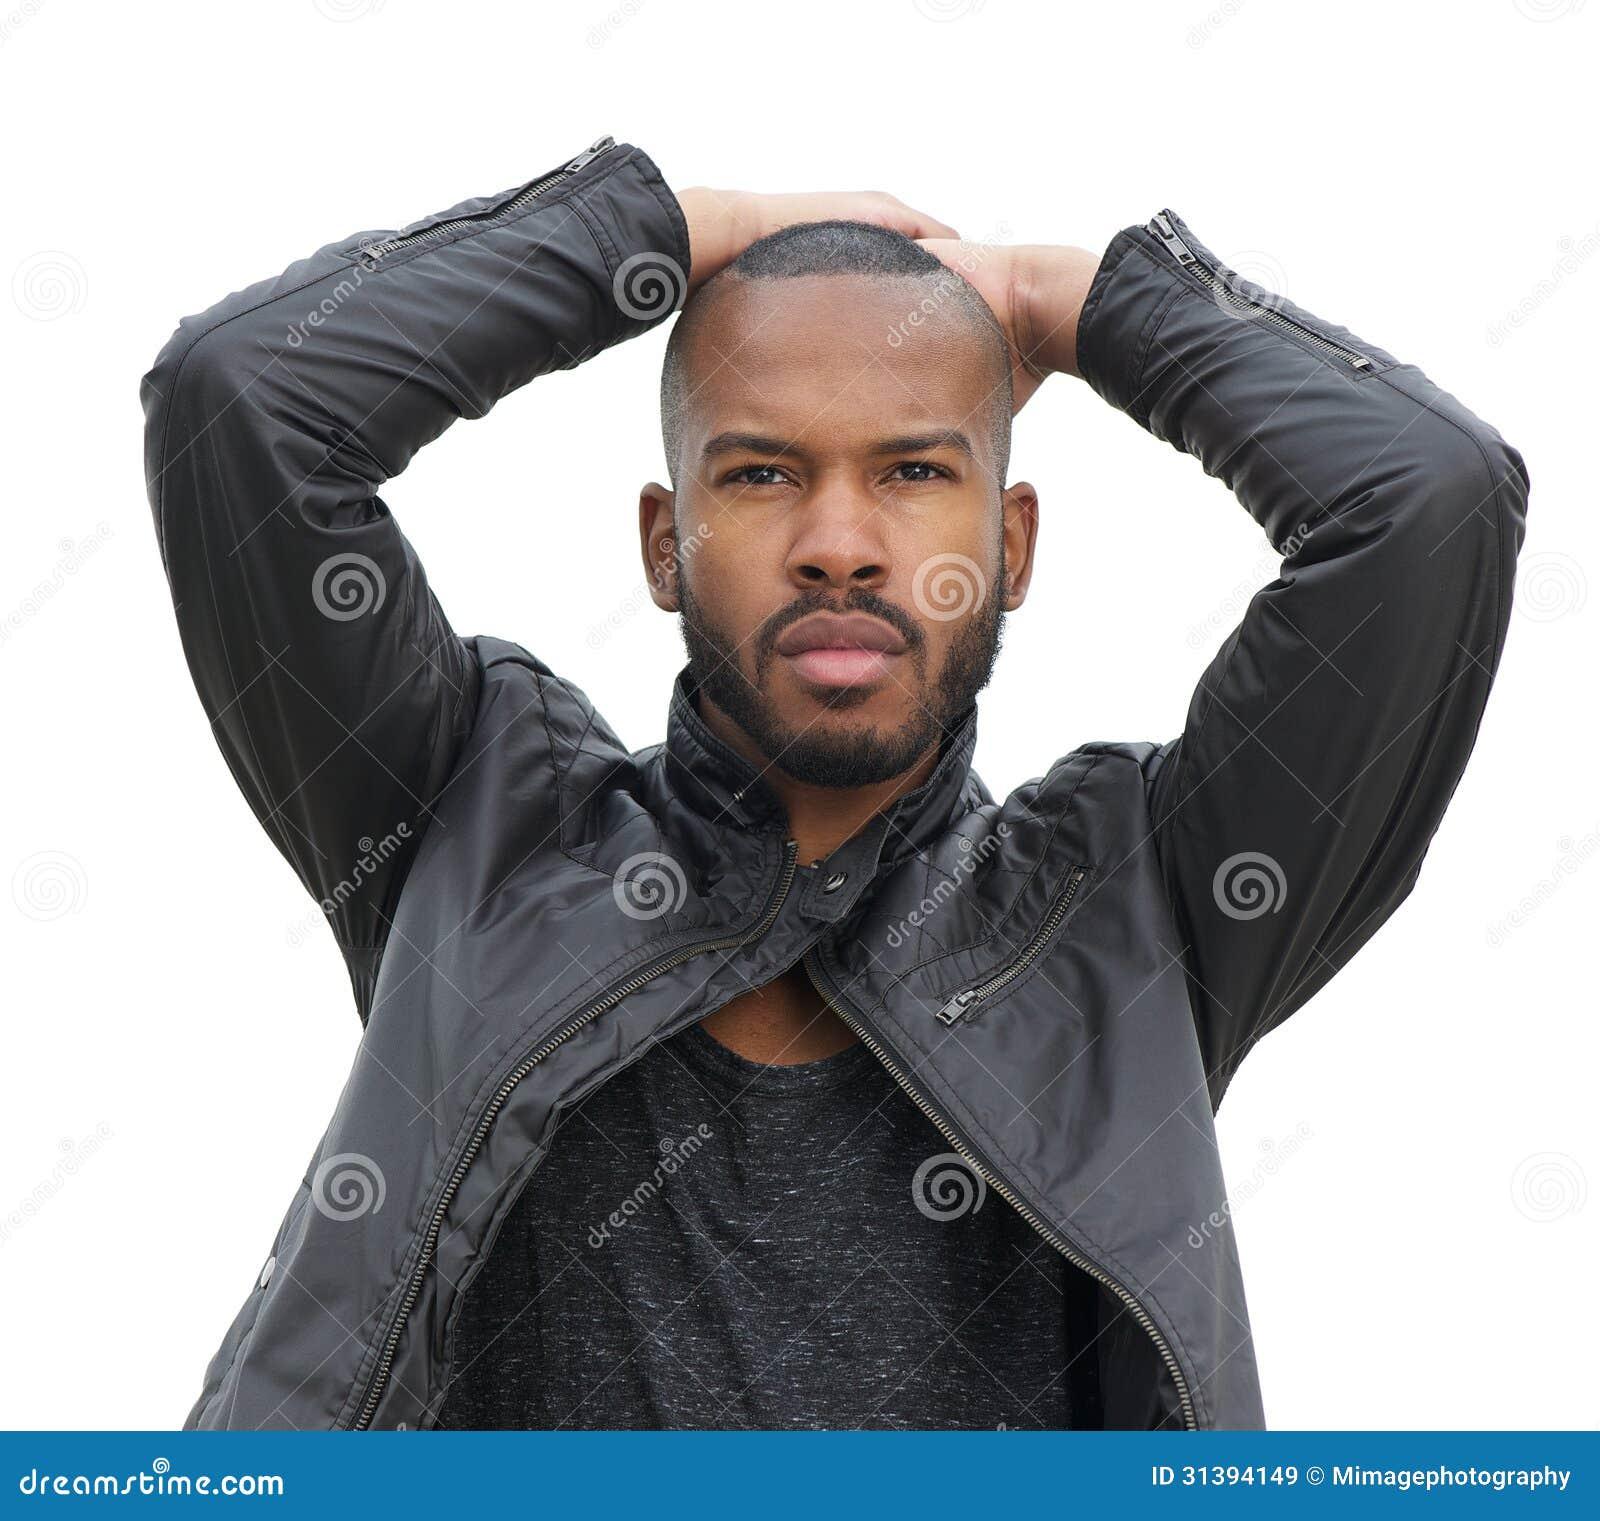 Black Fashion Models Poses: Male Fashion Model Posing In Black Leather Jacket Stock